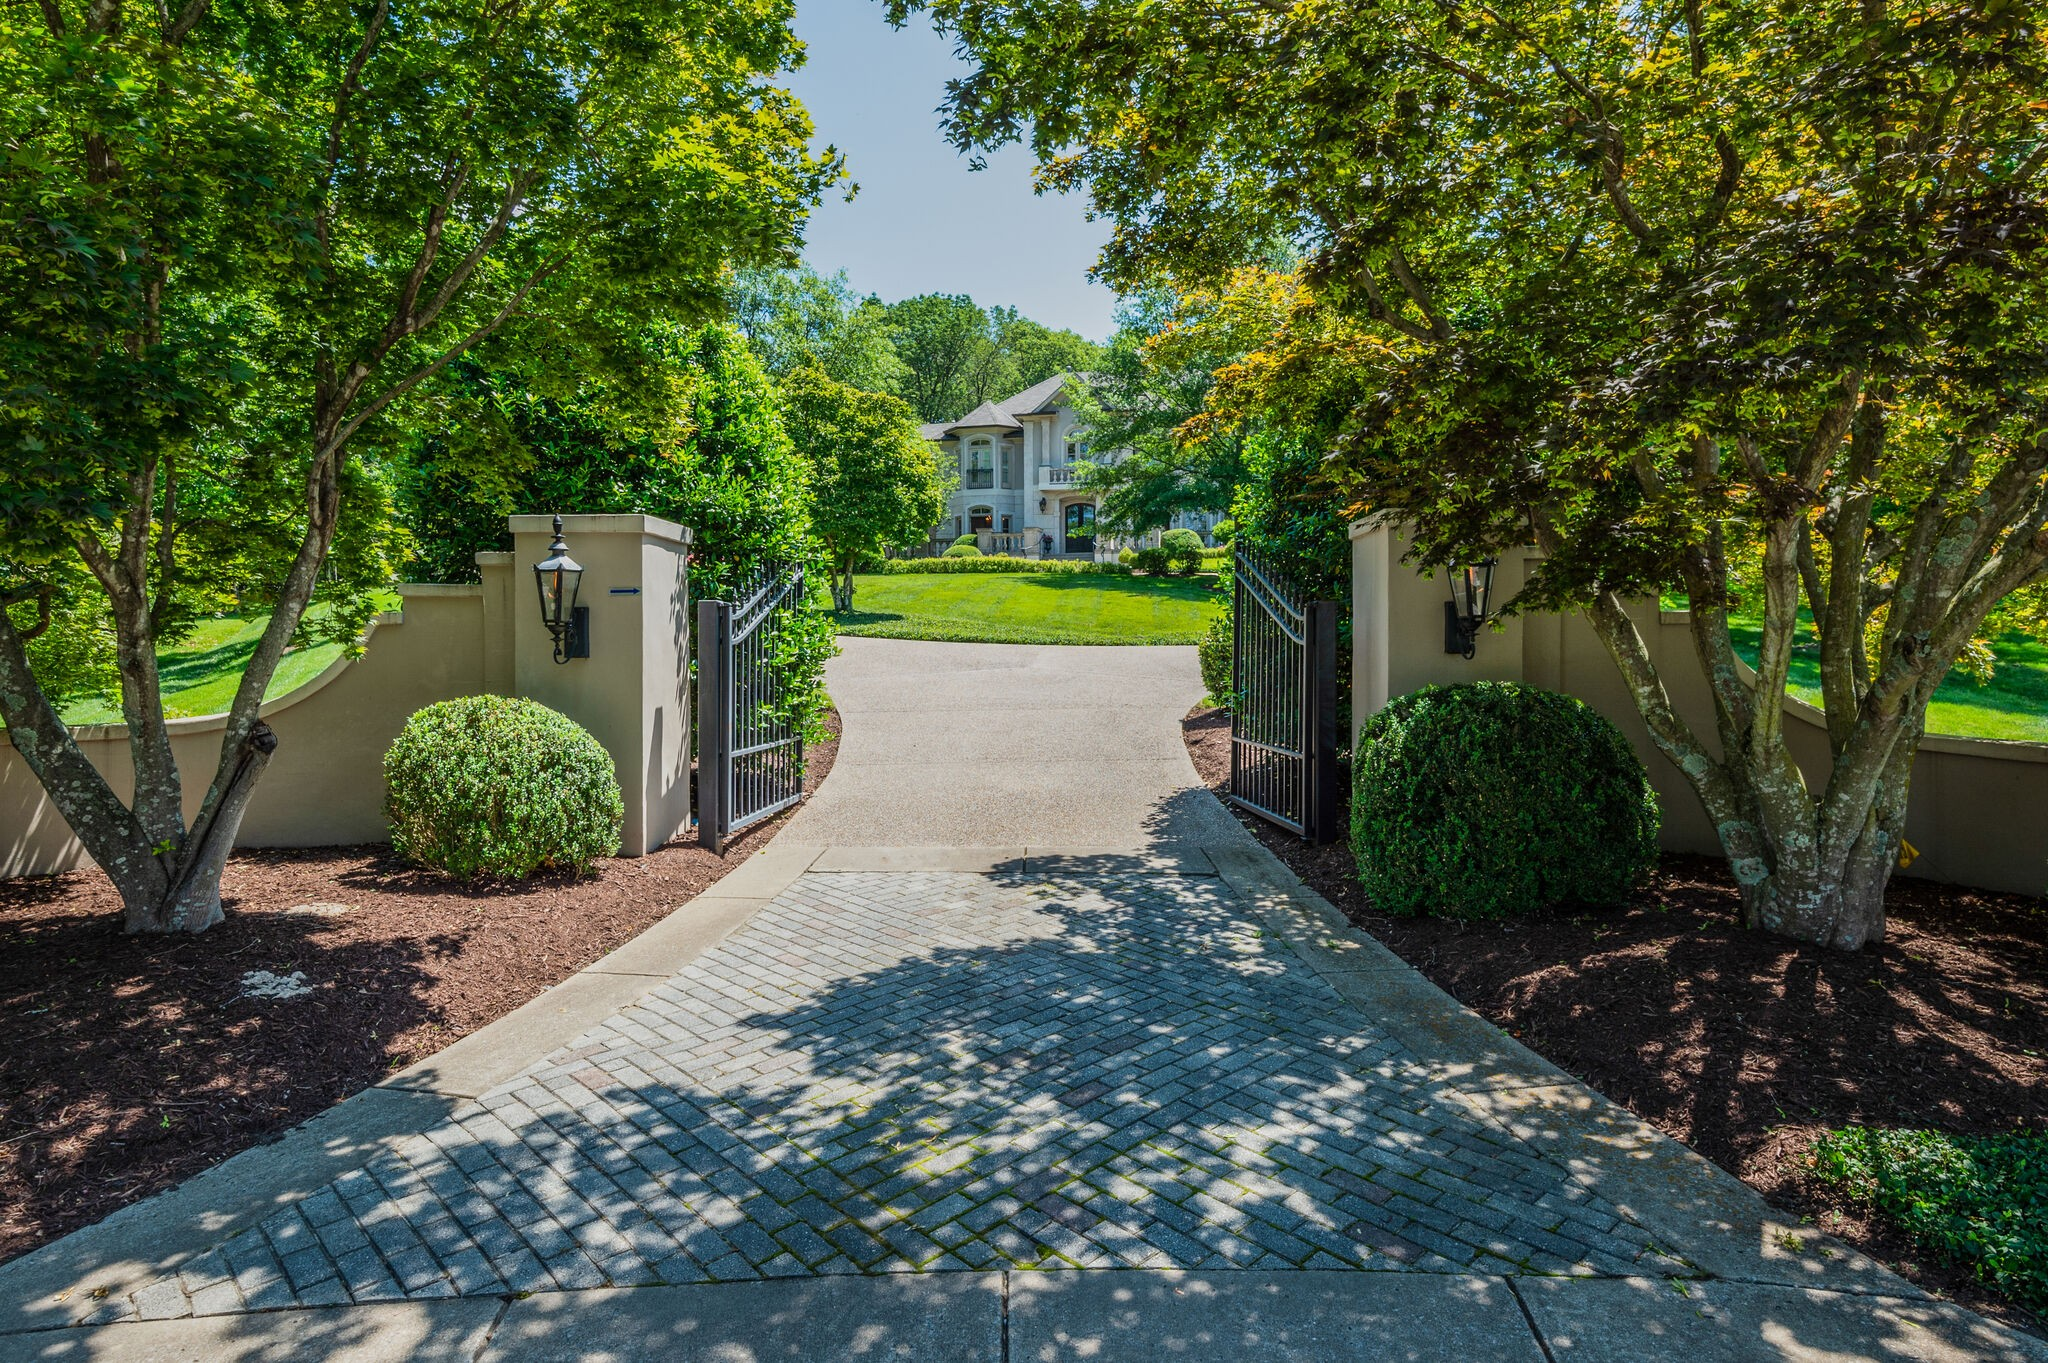 823 Tyne Valley Ct, Nashville, TN 37220 - Nashville, TN real estate listing